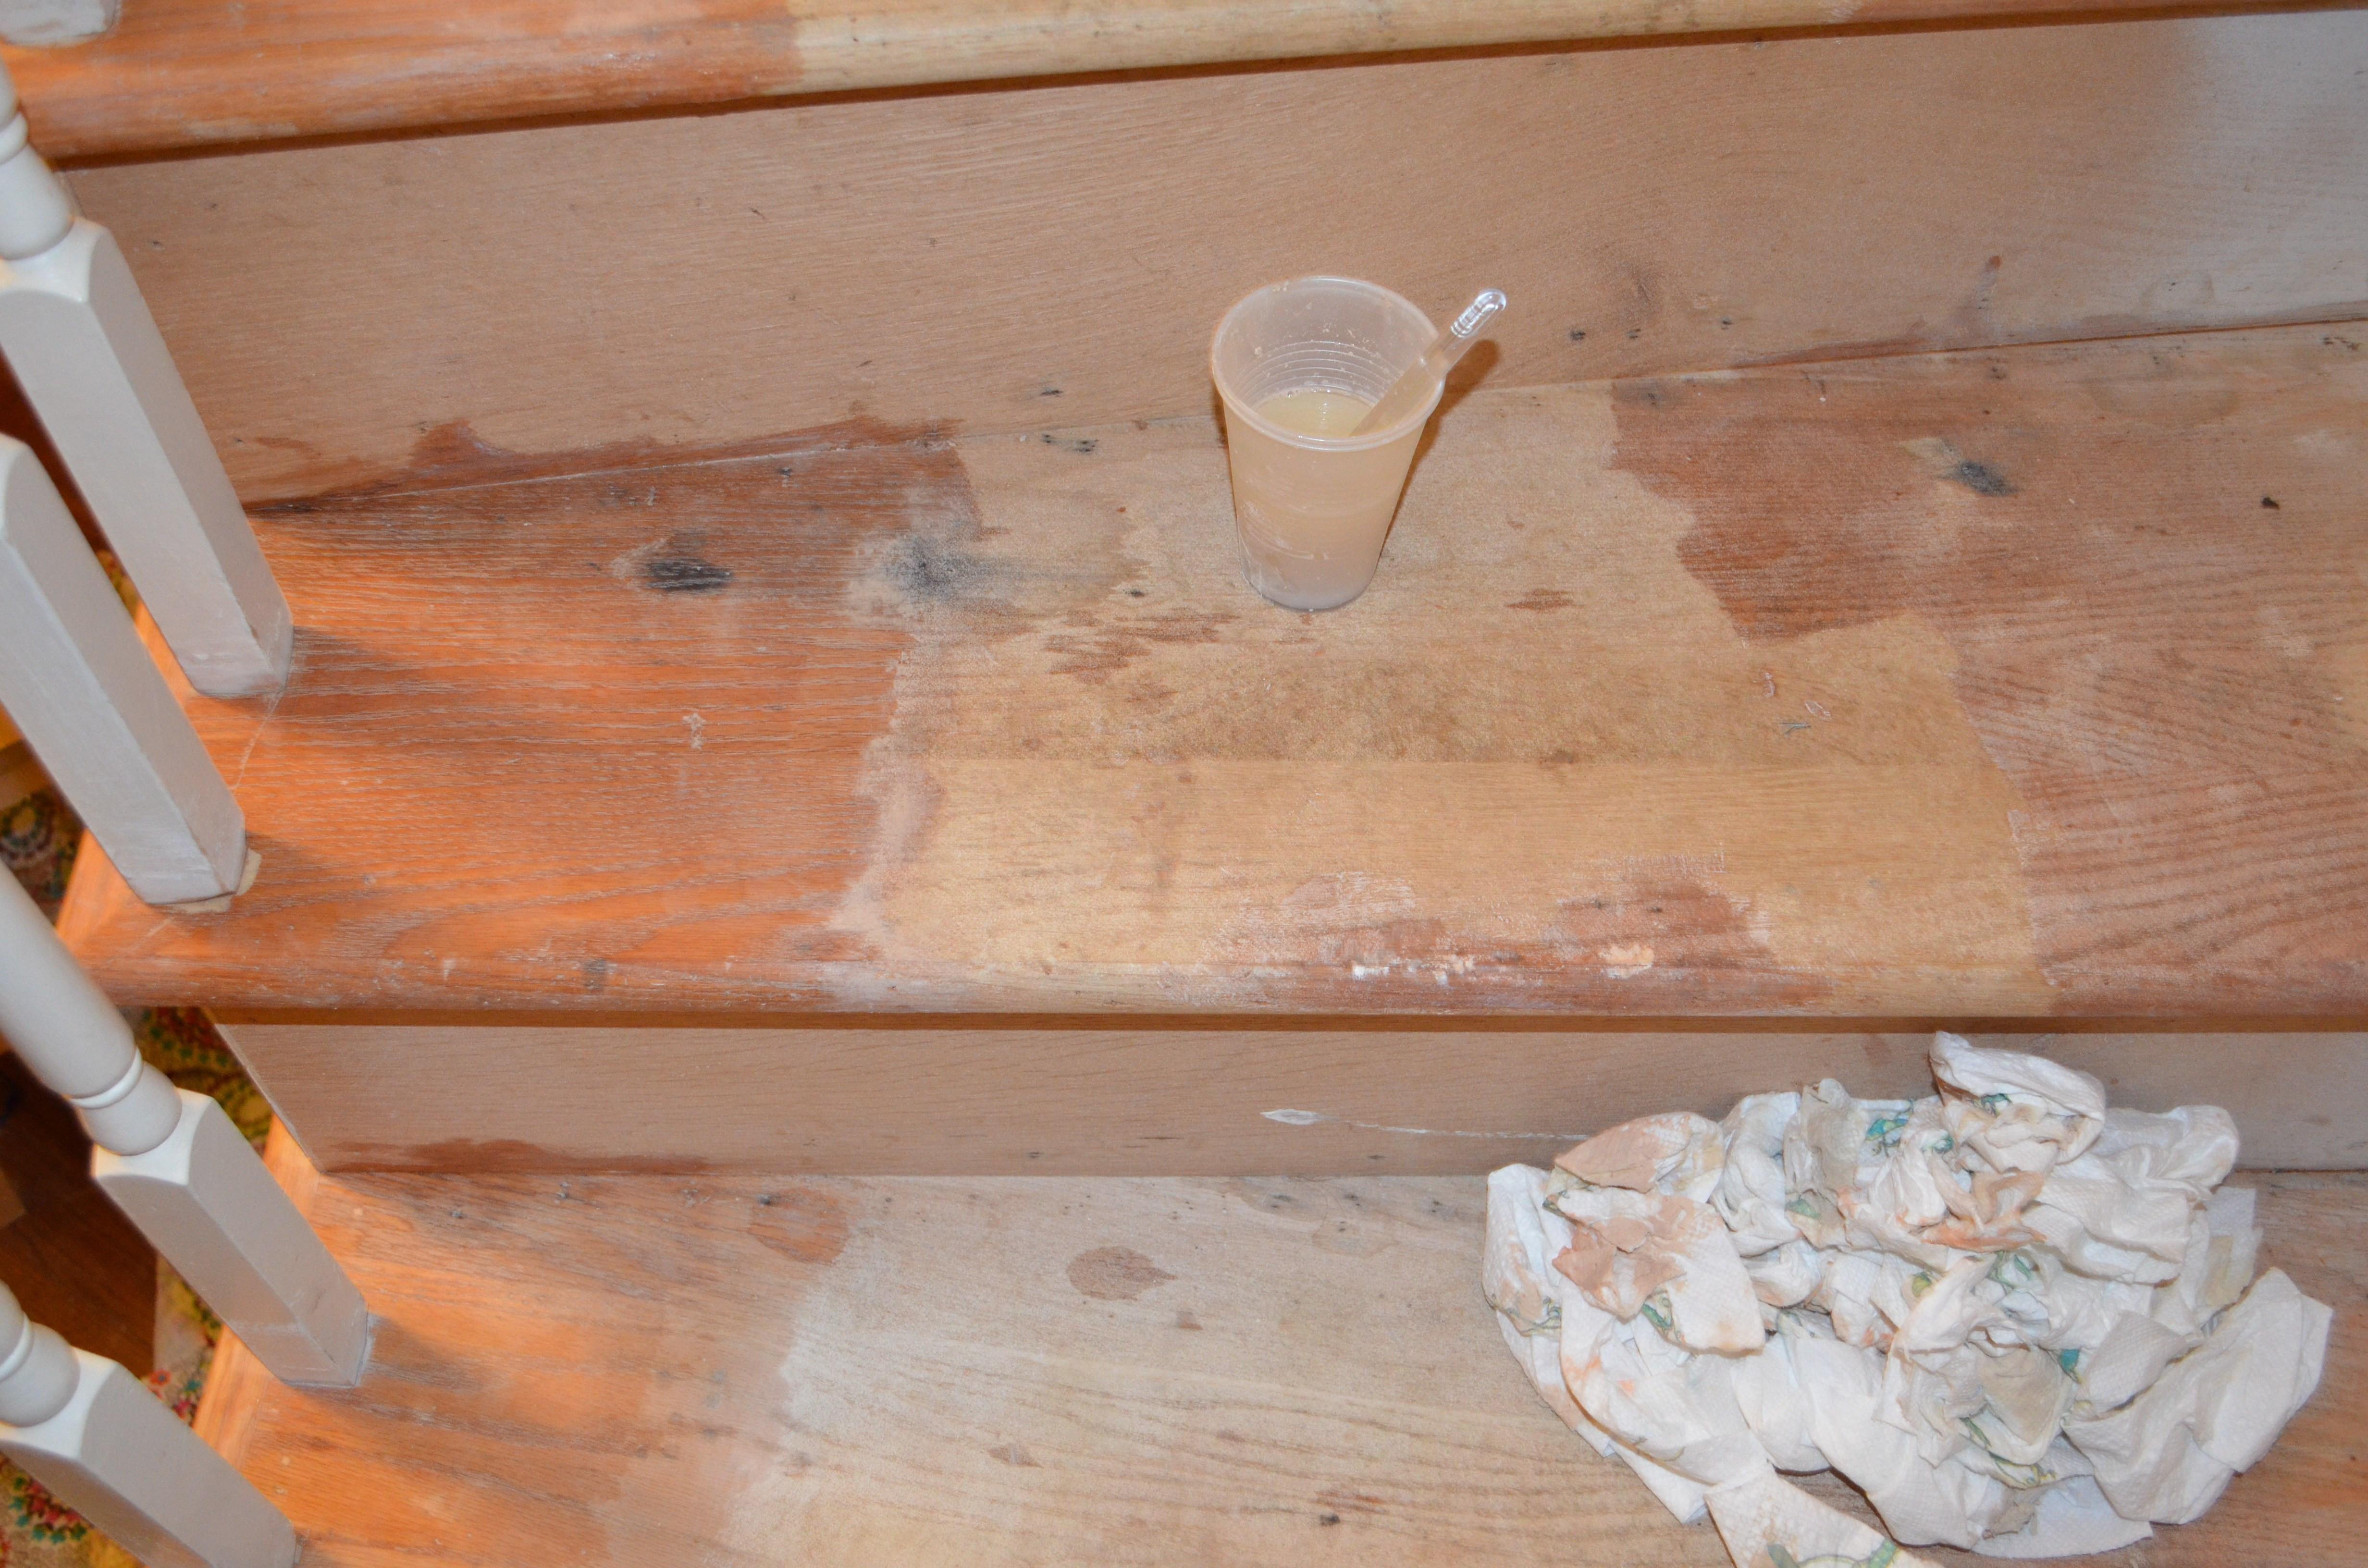 hardwood floor meets carpeted stairs of upstairs hallway 1 installing hardwood floors for staircase 4 filling holes sanding stripping